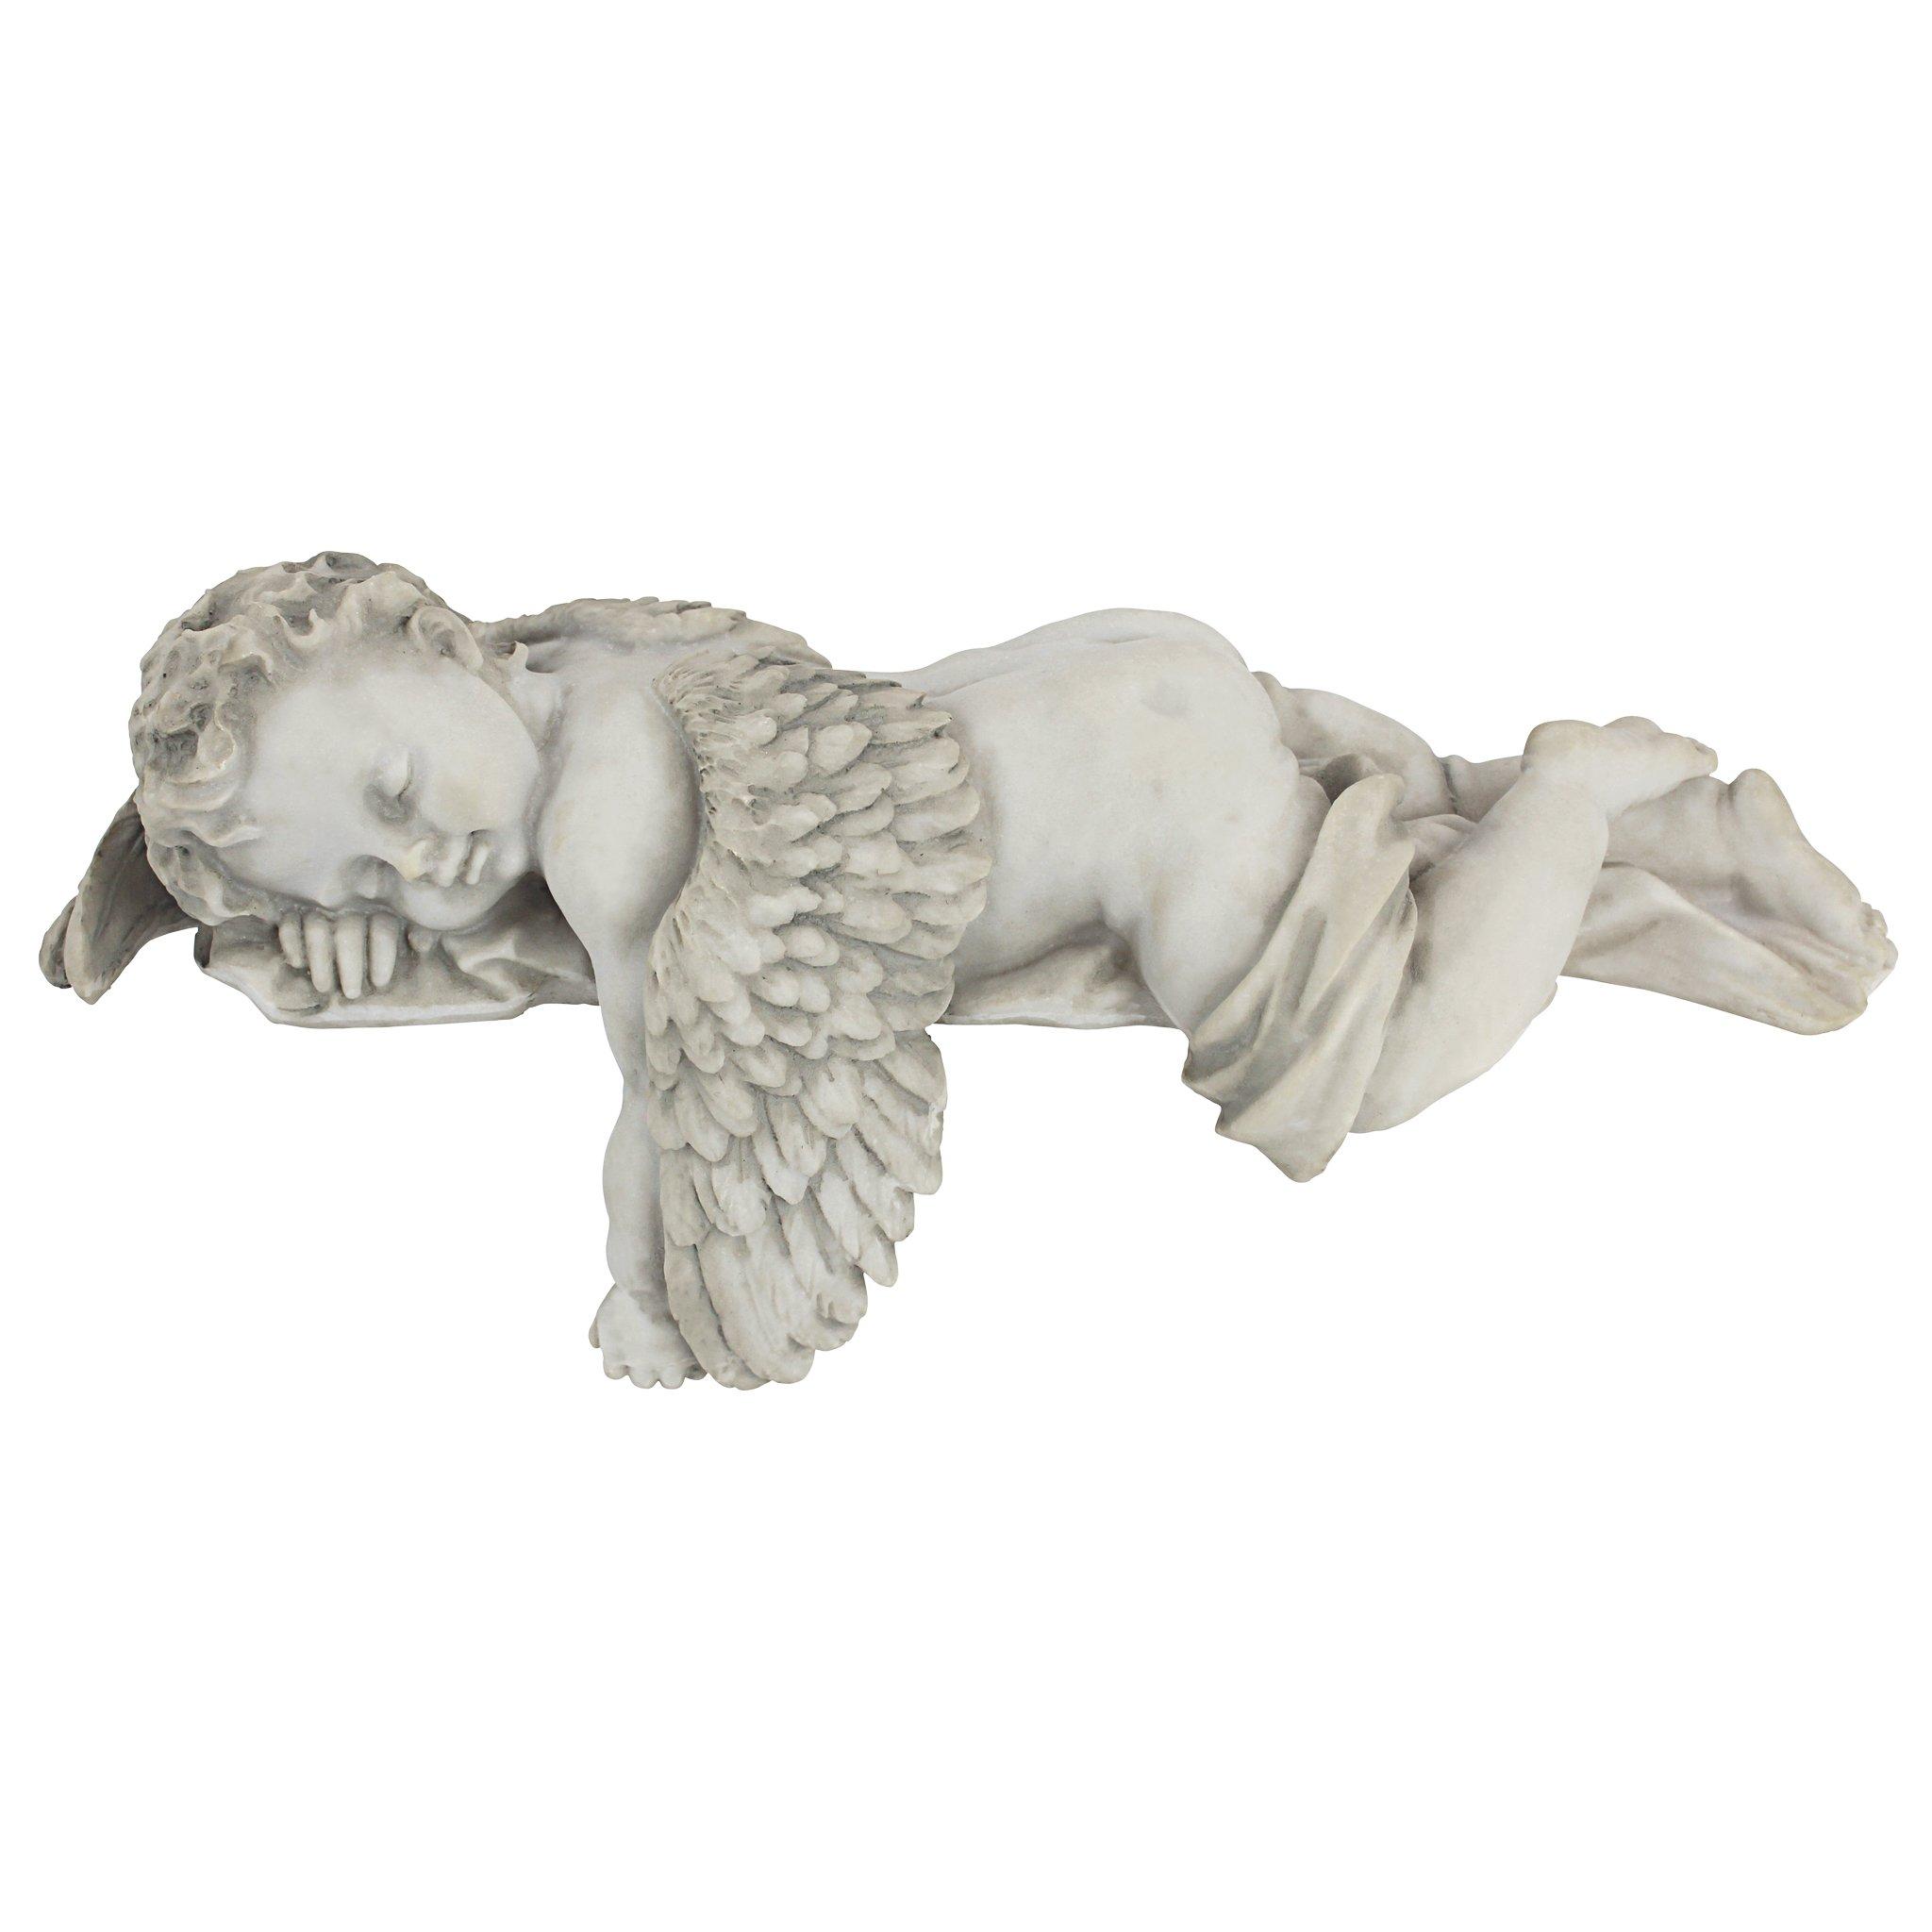 Design Toscano Sleepy Time Baby Angel Napping Shelf Sitter Statue, 12 Inch, Single